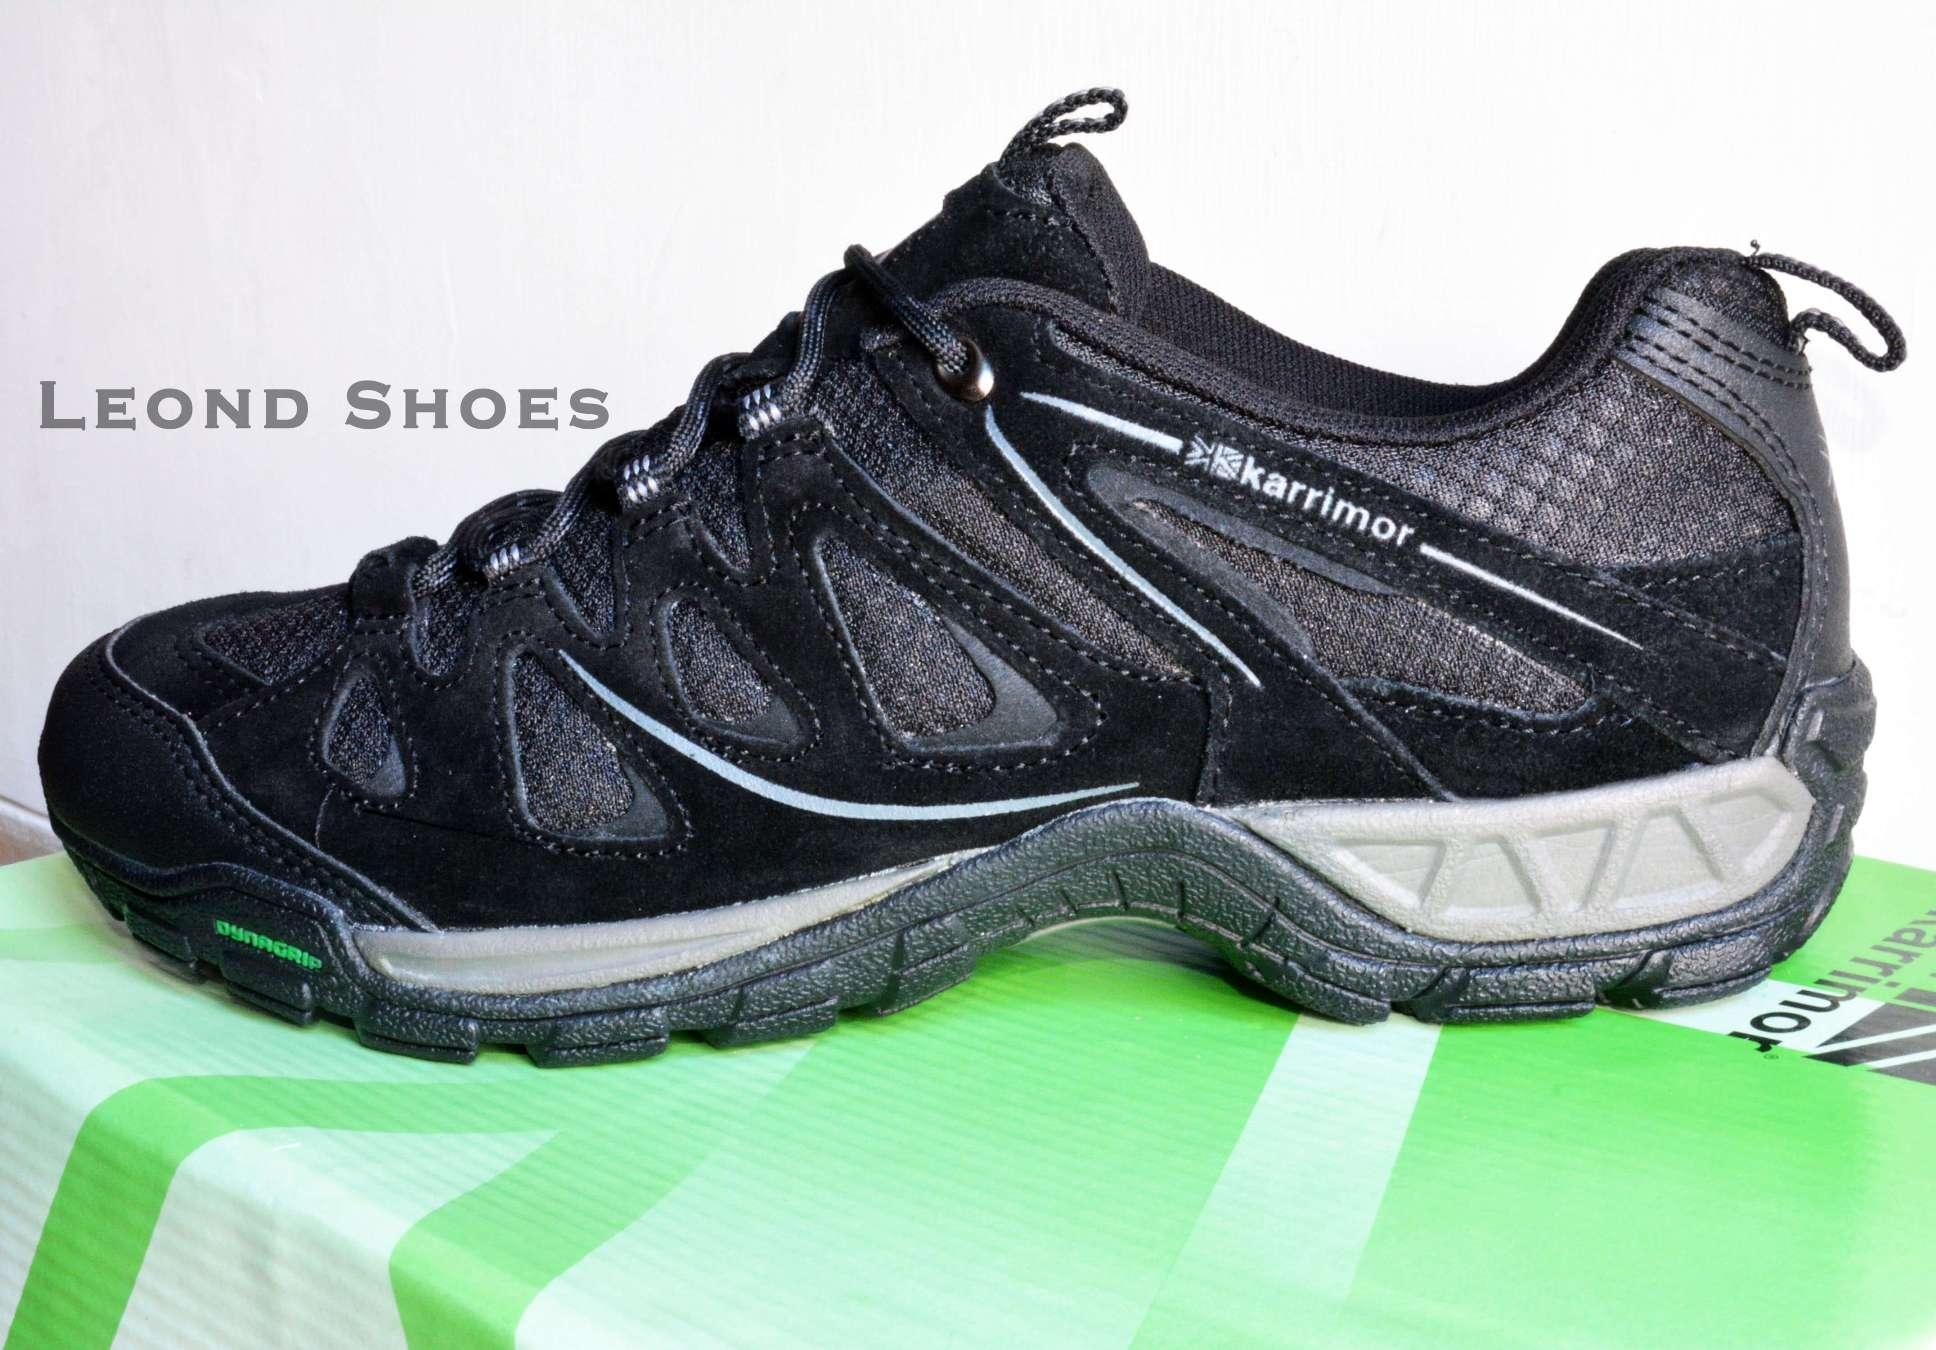 Sepatu Hiking Karrimor Summit Original - Grosir Sepatu Gunung Outdoor